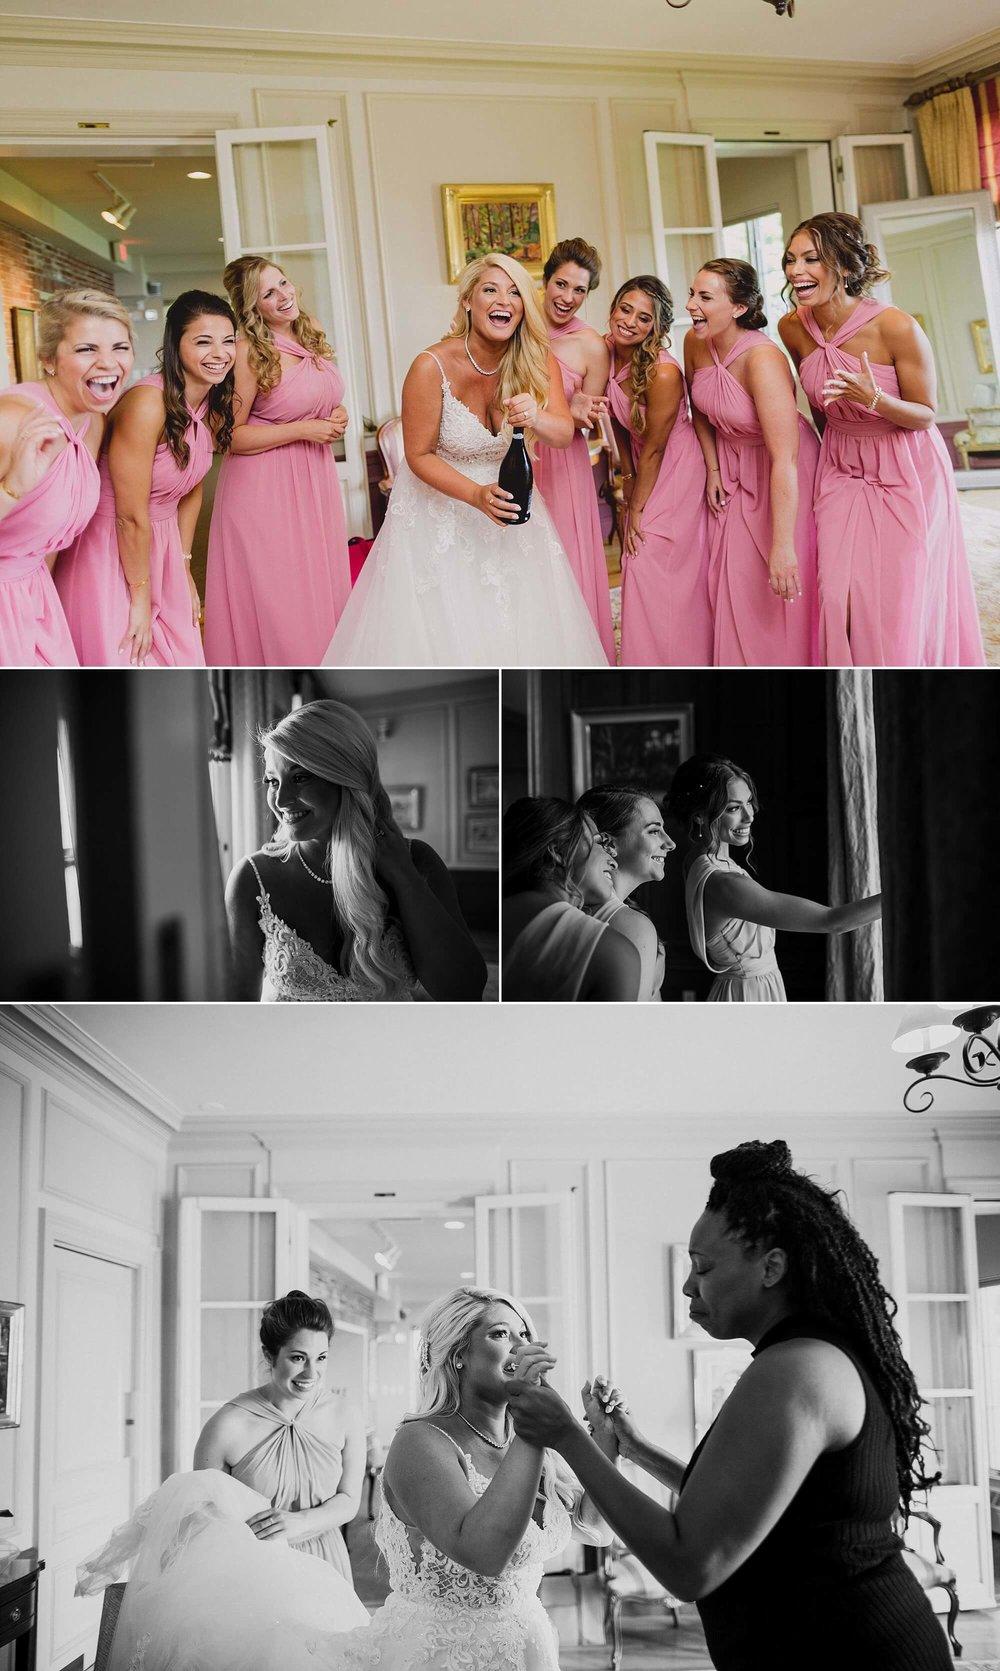 Misselwood Wedding - Ebersole photo-4.jpg